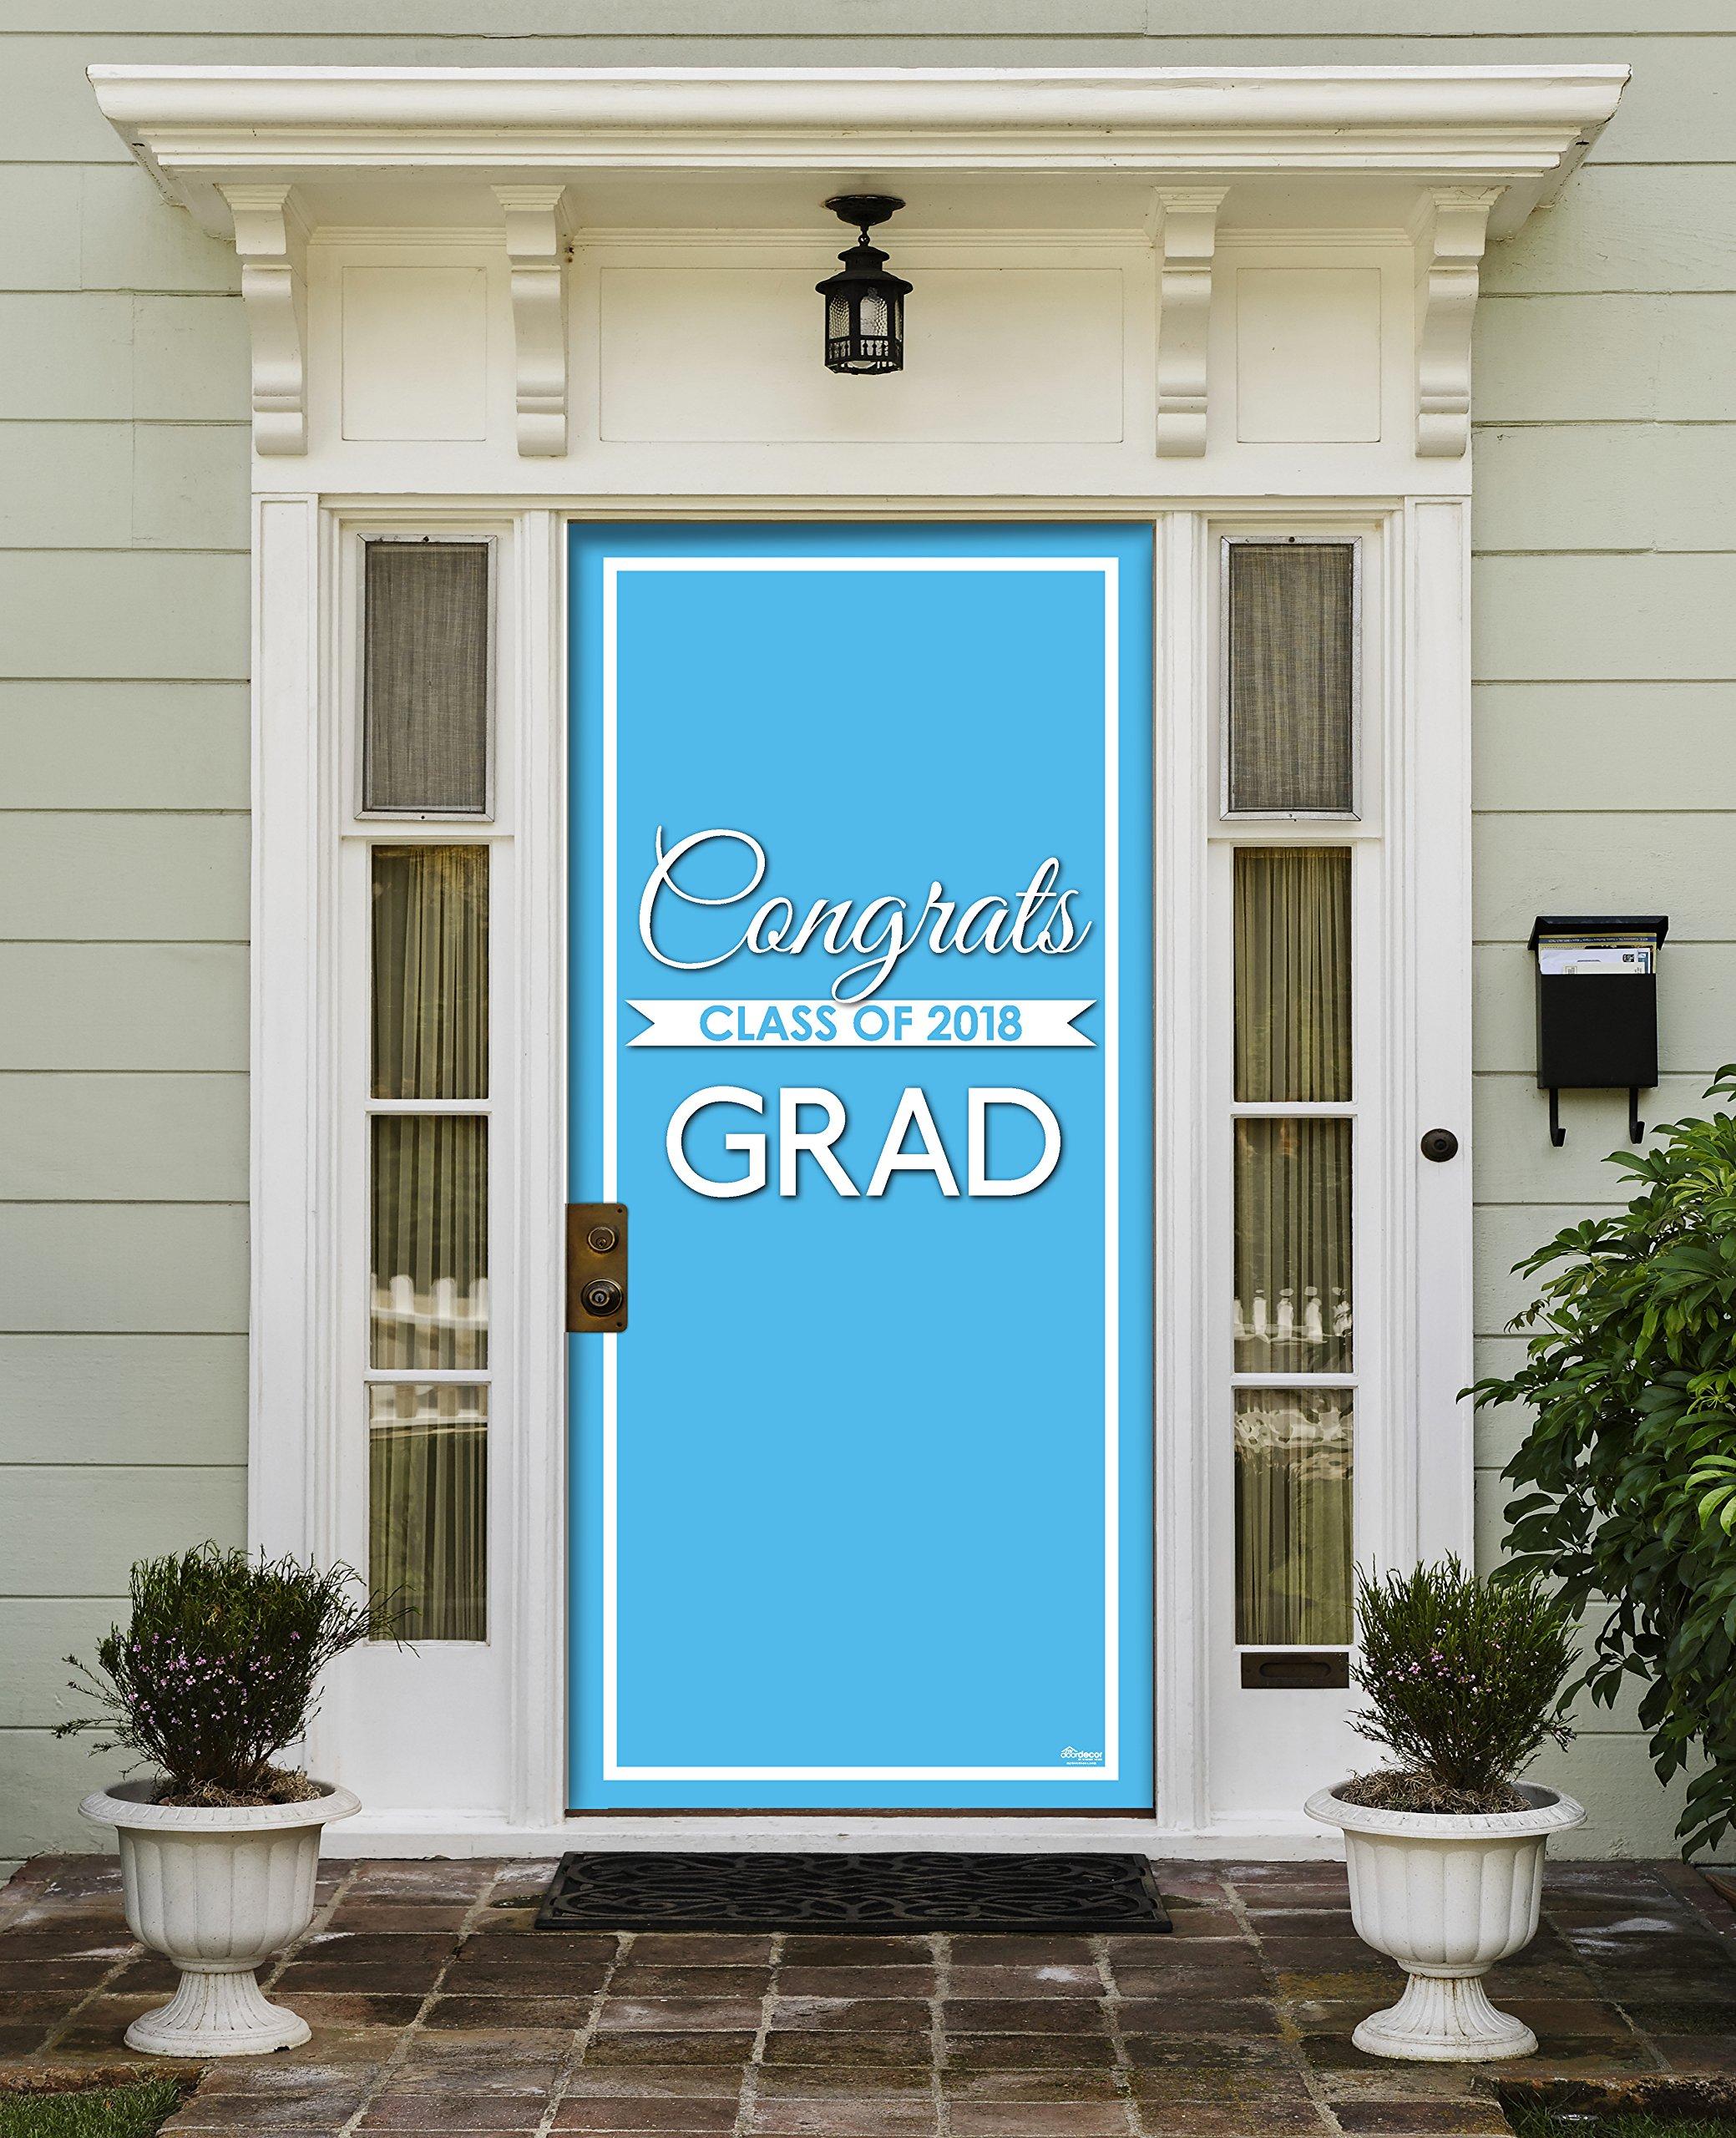 Victory Corps Class Banner Light Blue - Outdoor GRADUATION Garage Door Banner Mural Sign Décor 36'' x 80'' One Size Fits All Front Door Car Garage -The Original Holiday Front Door Banner Decor